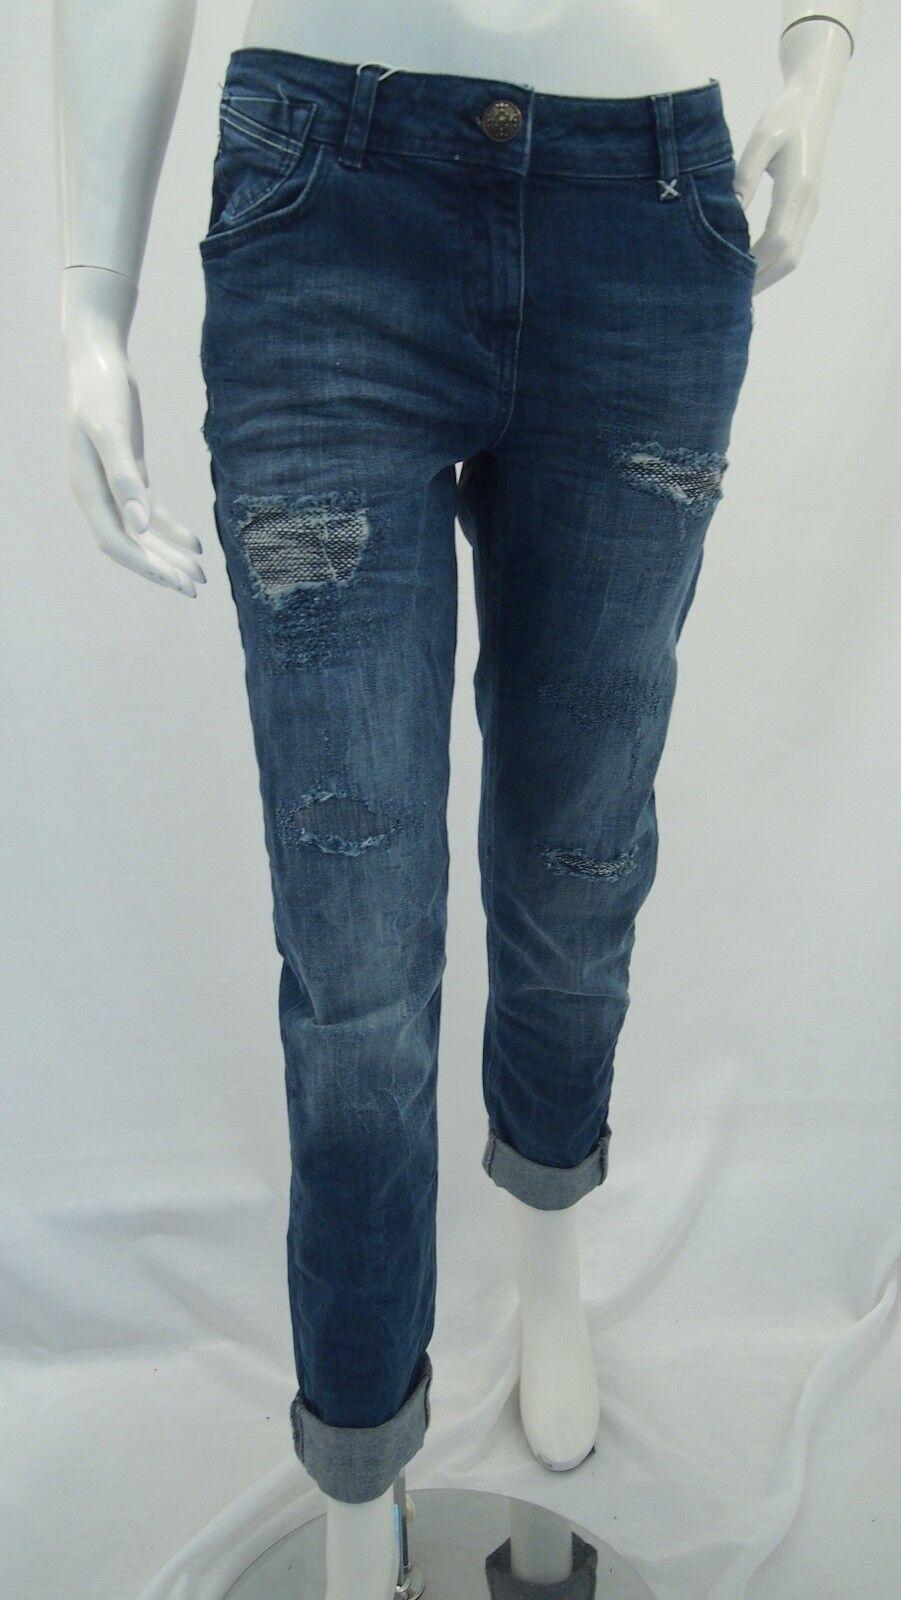 Cecil heavy heavy heavy used Denim Scarlett Jeans Donna Articolo N. b371055 JEANS NUOVO 35806a